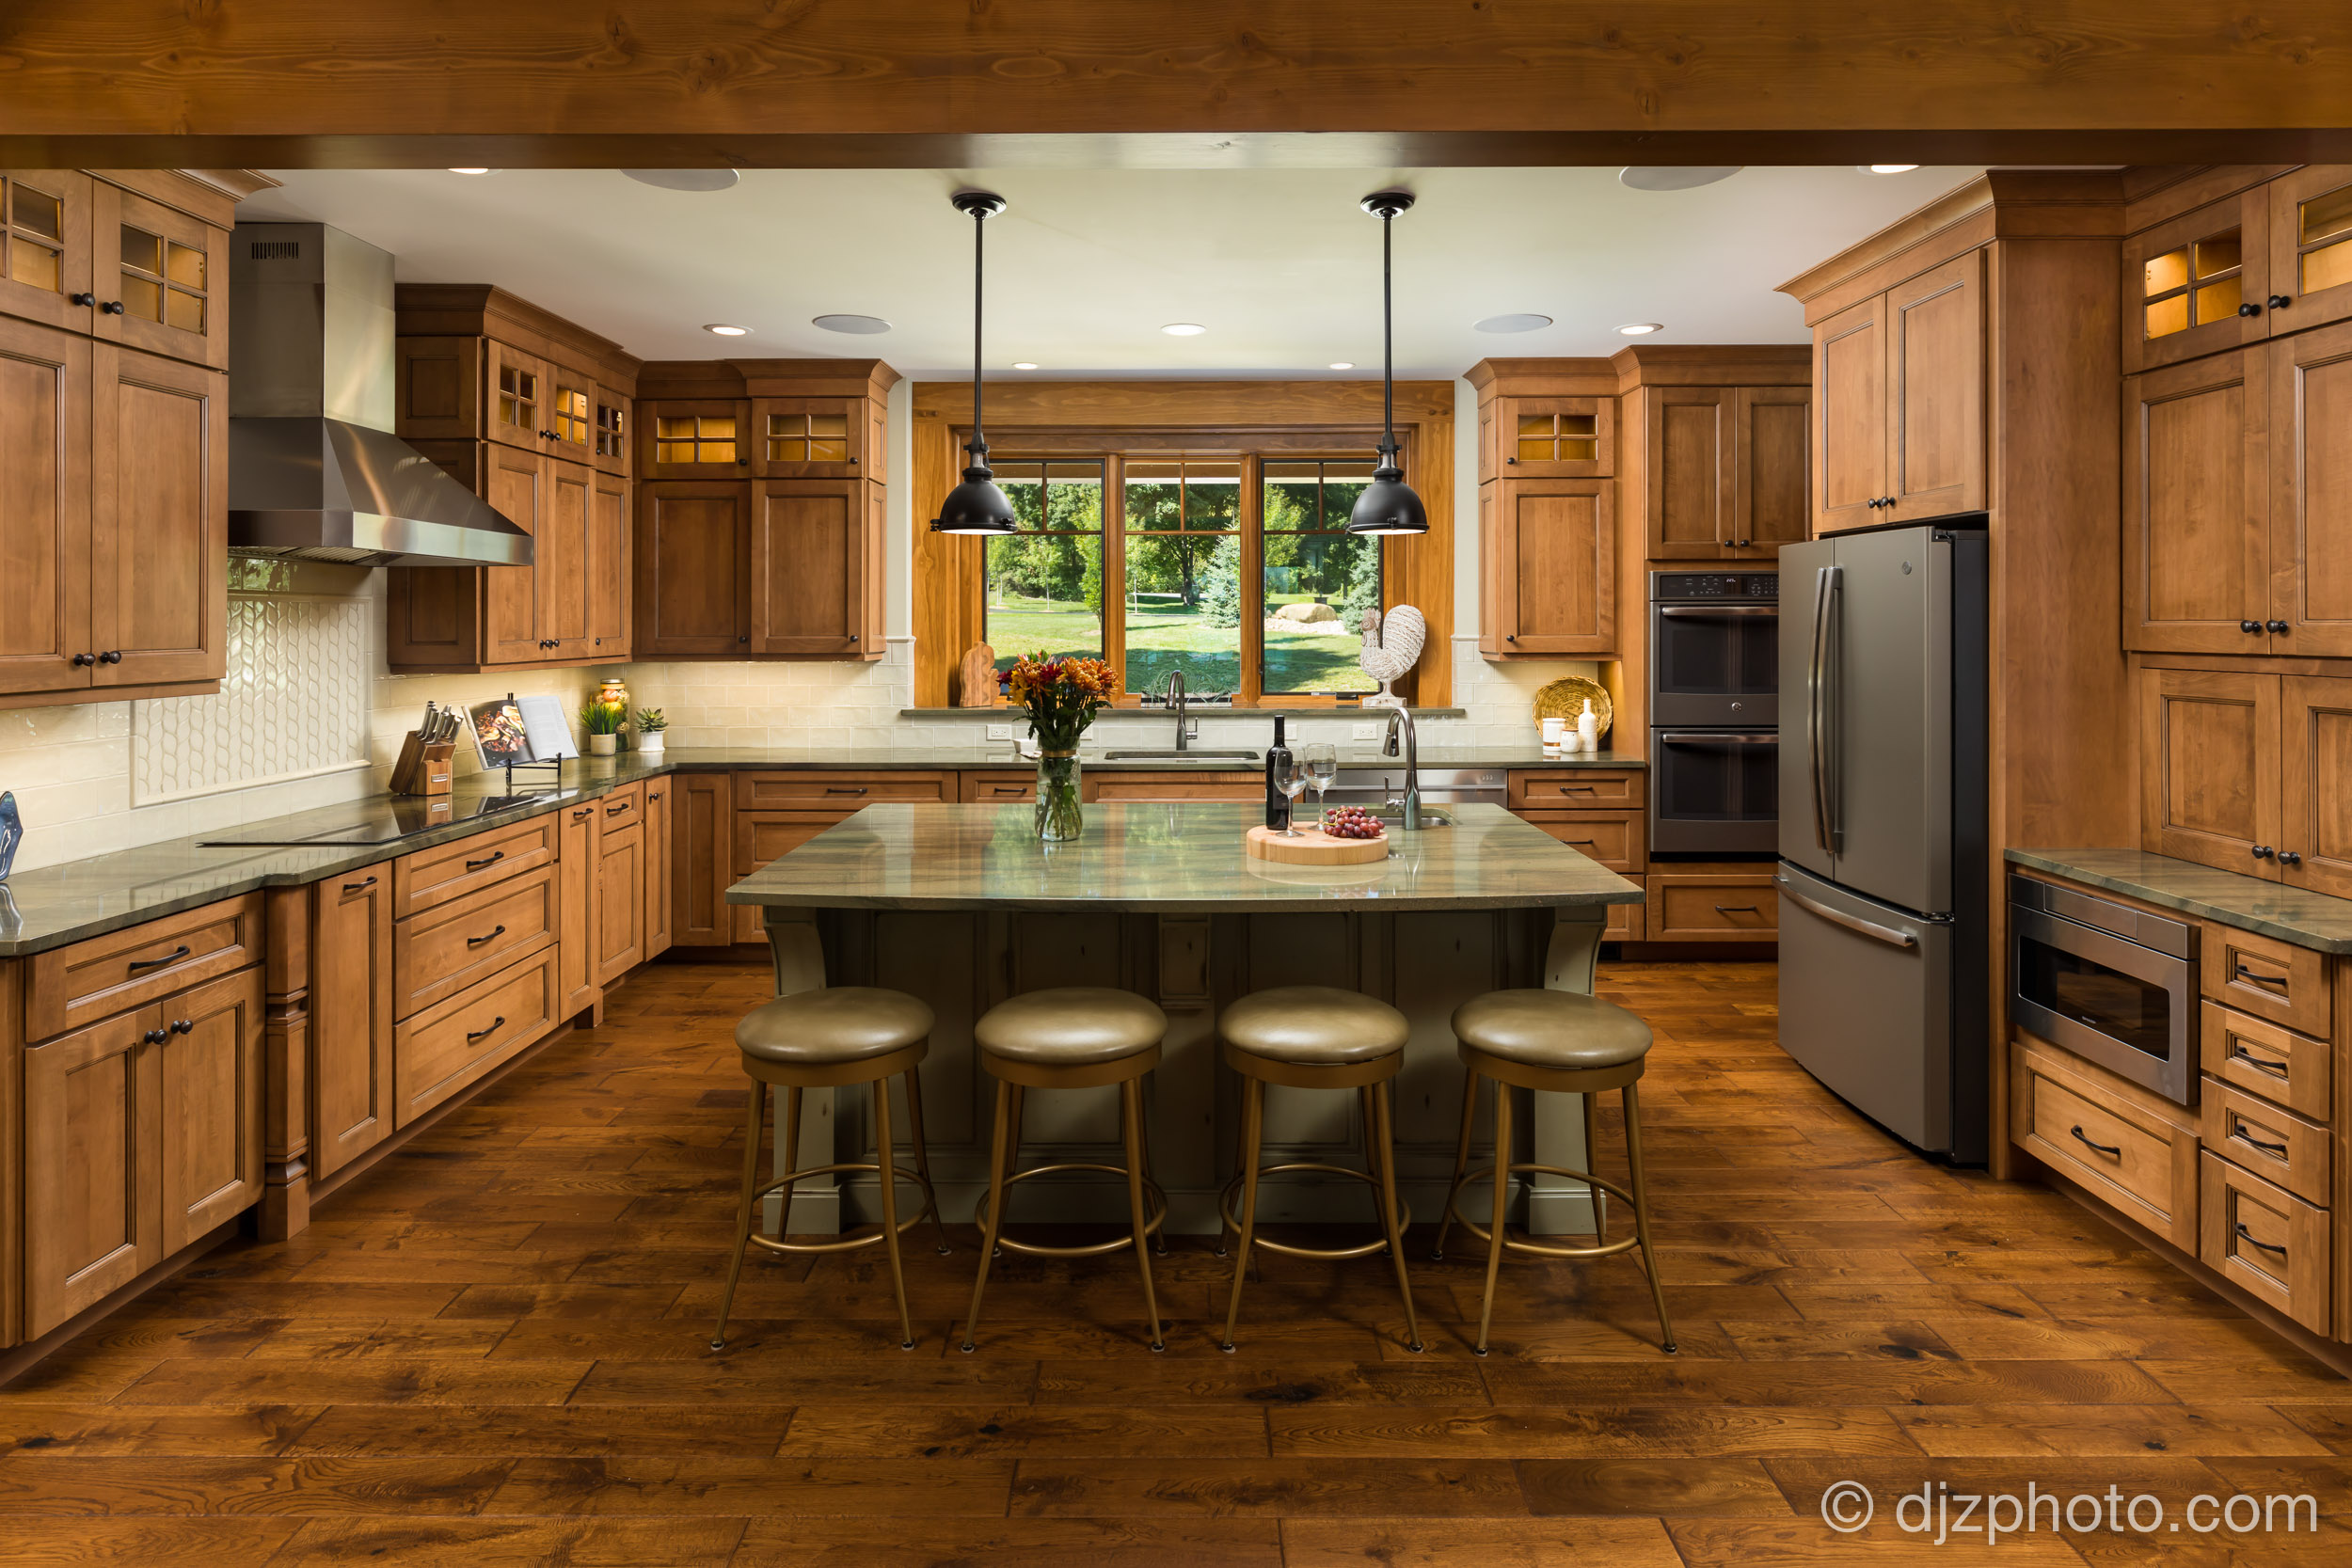 Djz Photography Real Estate Photographer Grand Rapids Mi